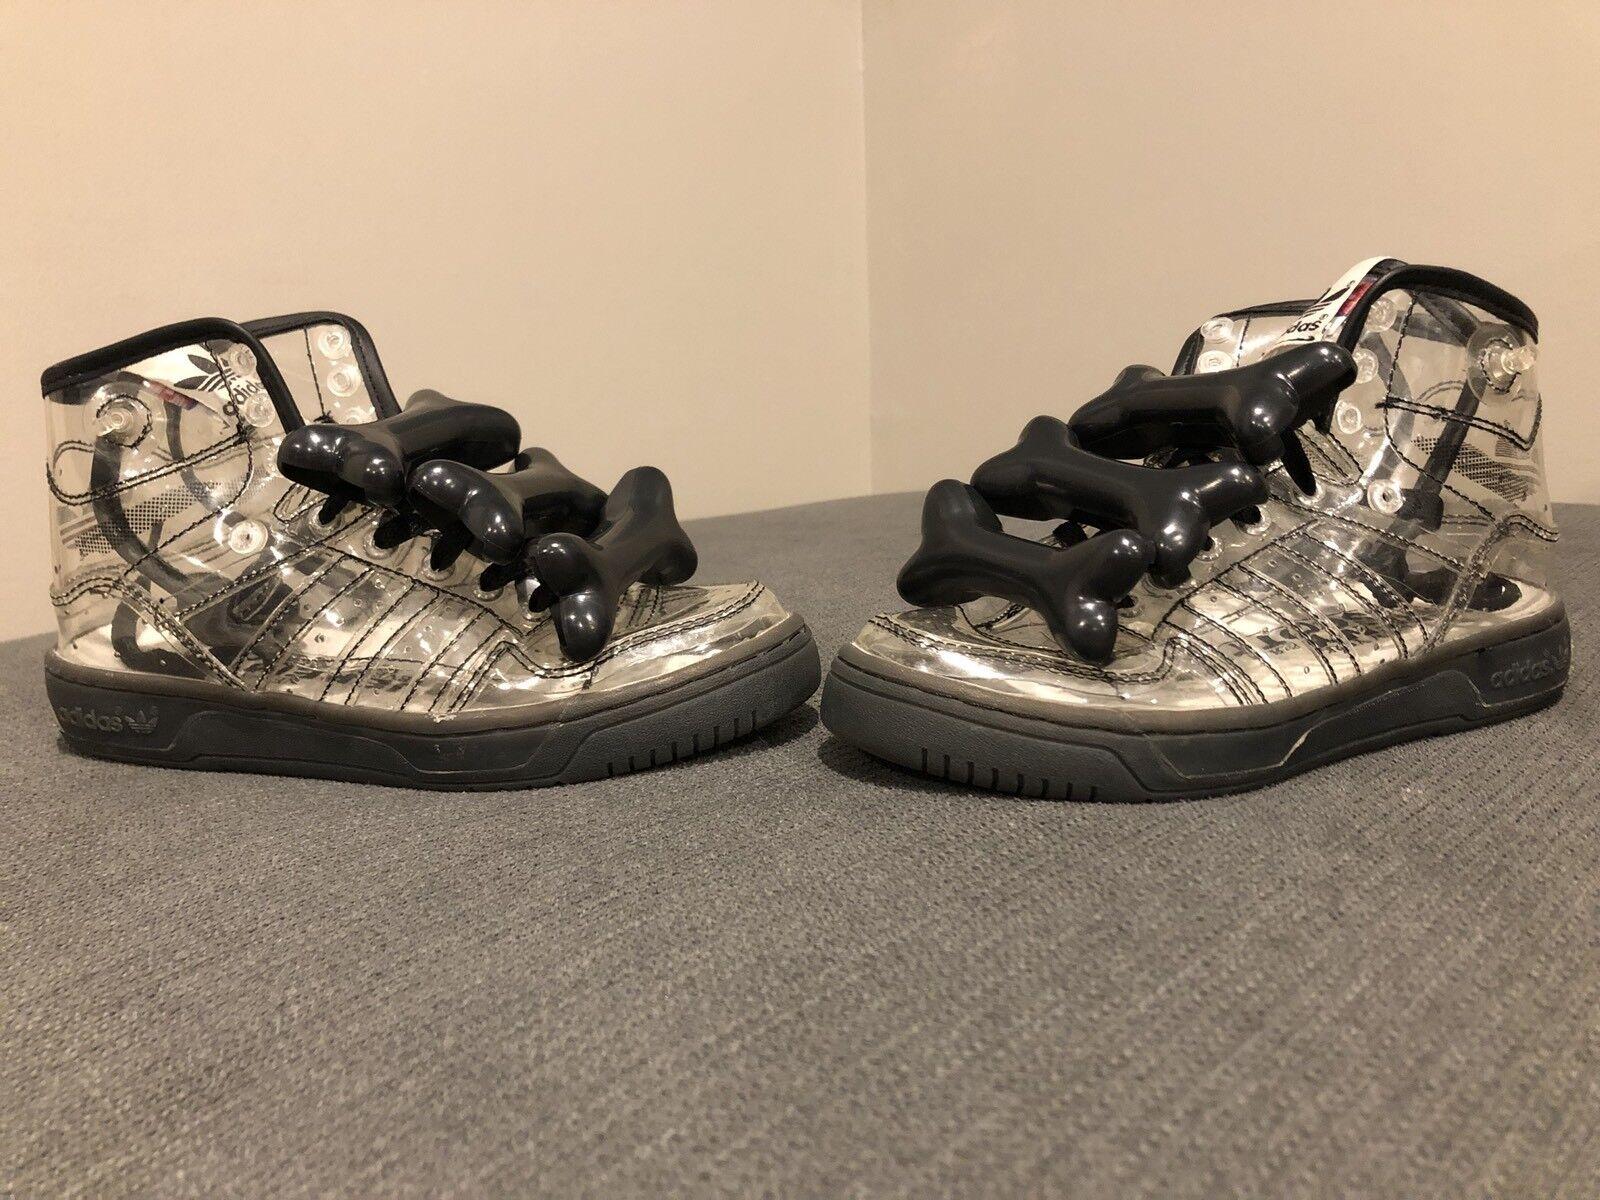 Adidas Jeremy Scott Clear Asap Rocky Bones 2.0, Size 5, RARE